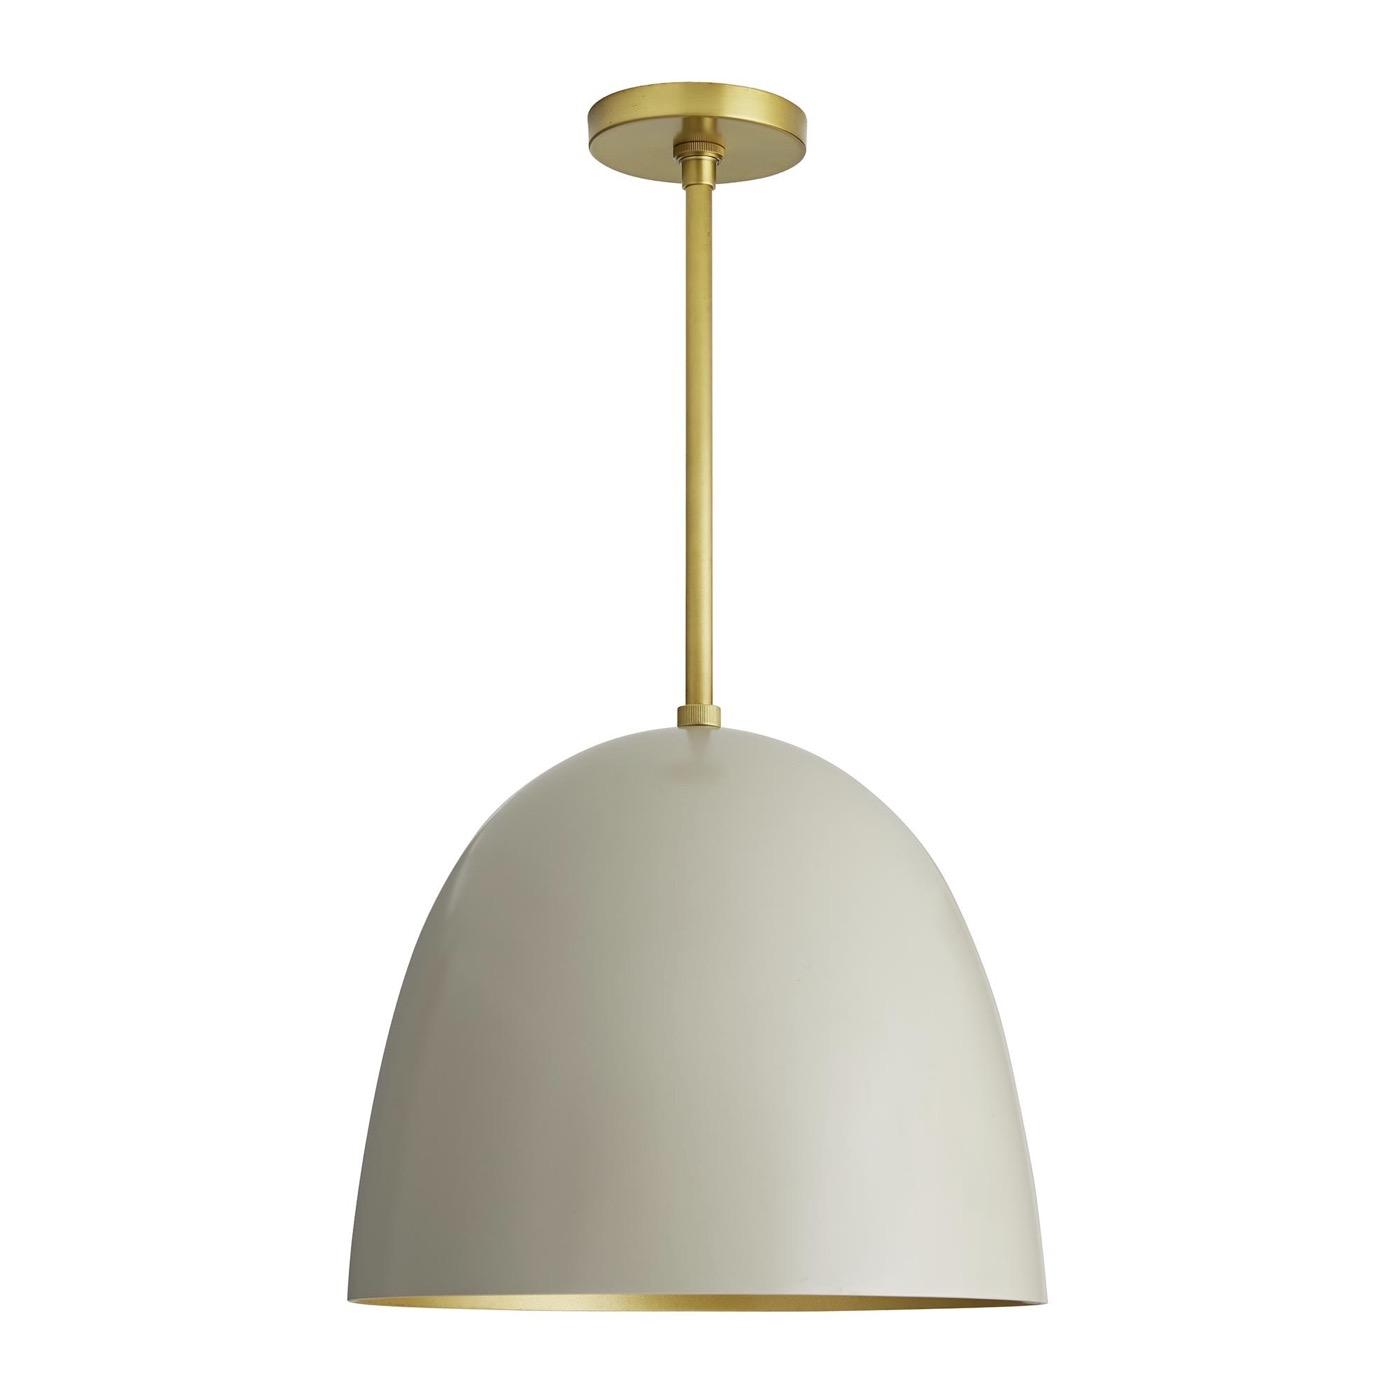 Rhys Petite Dome Pendant | White & Gold